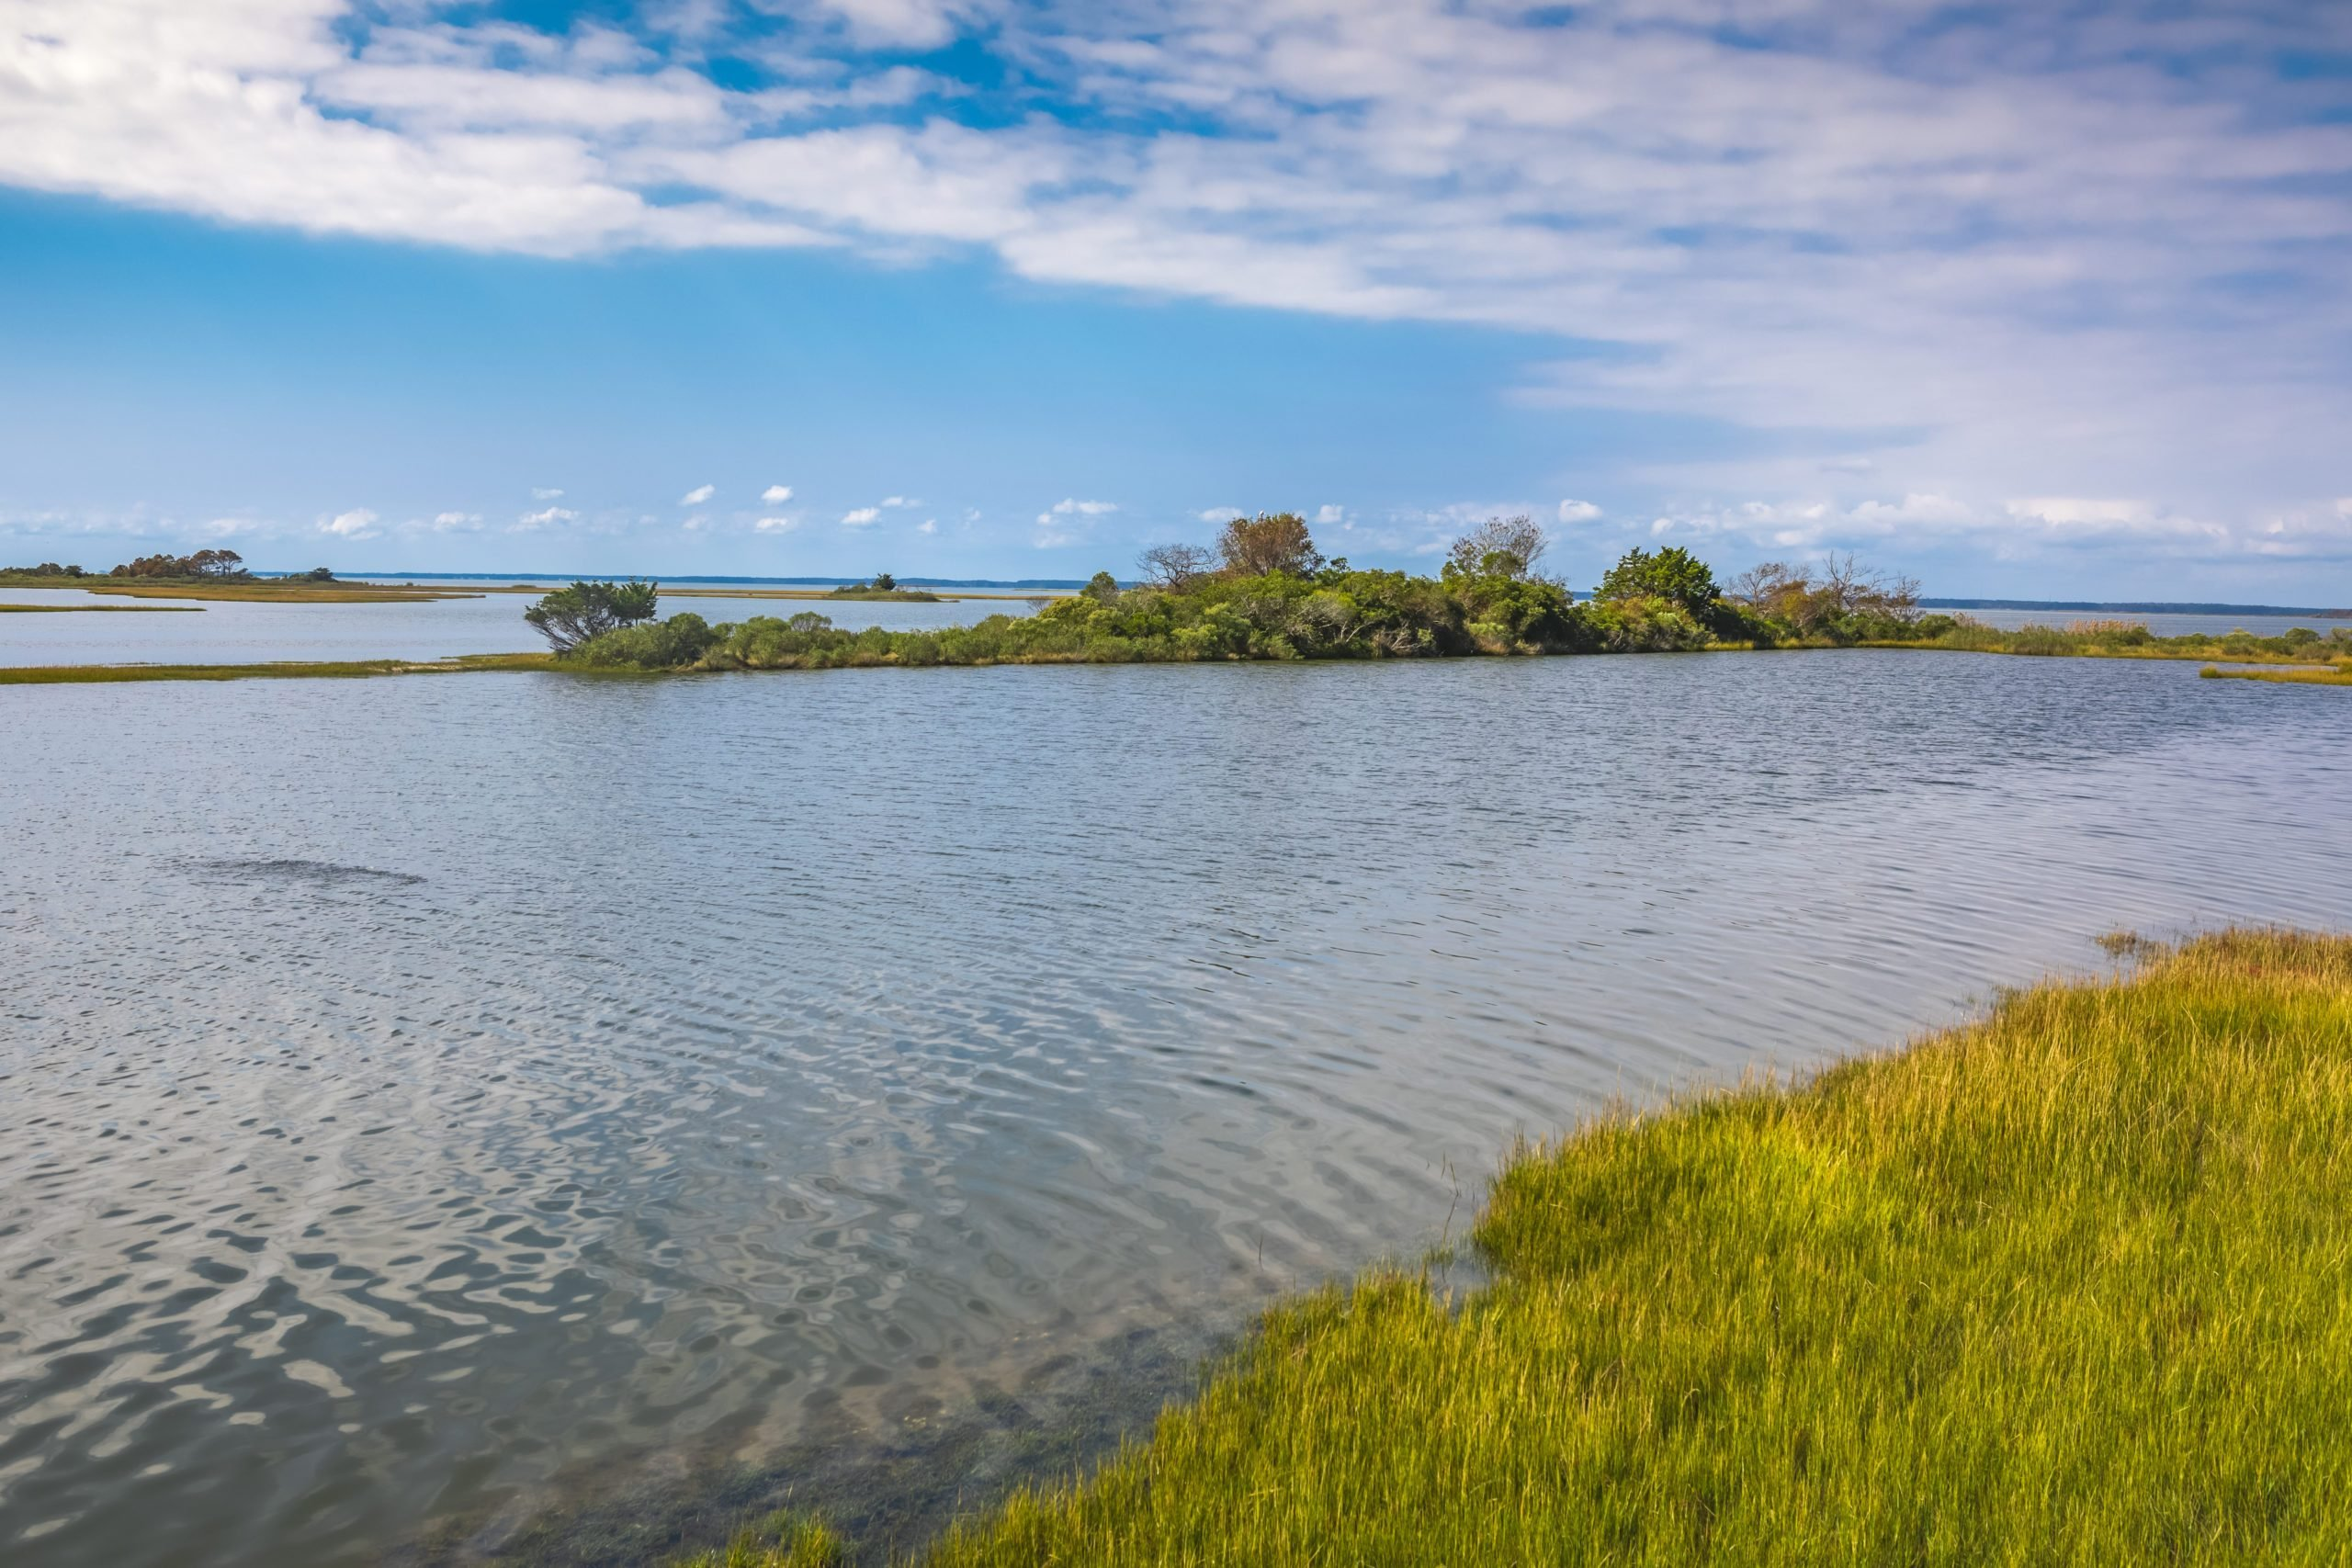 Life of the Marsh Nature Trail at Assateague National Seashore